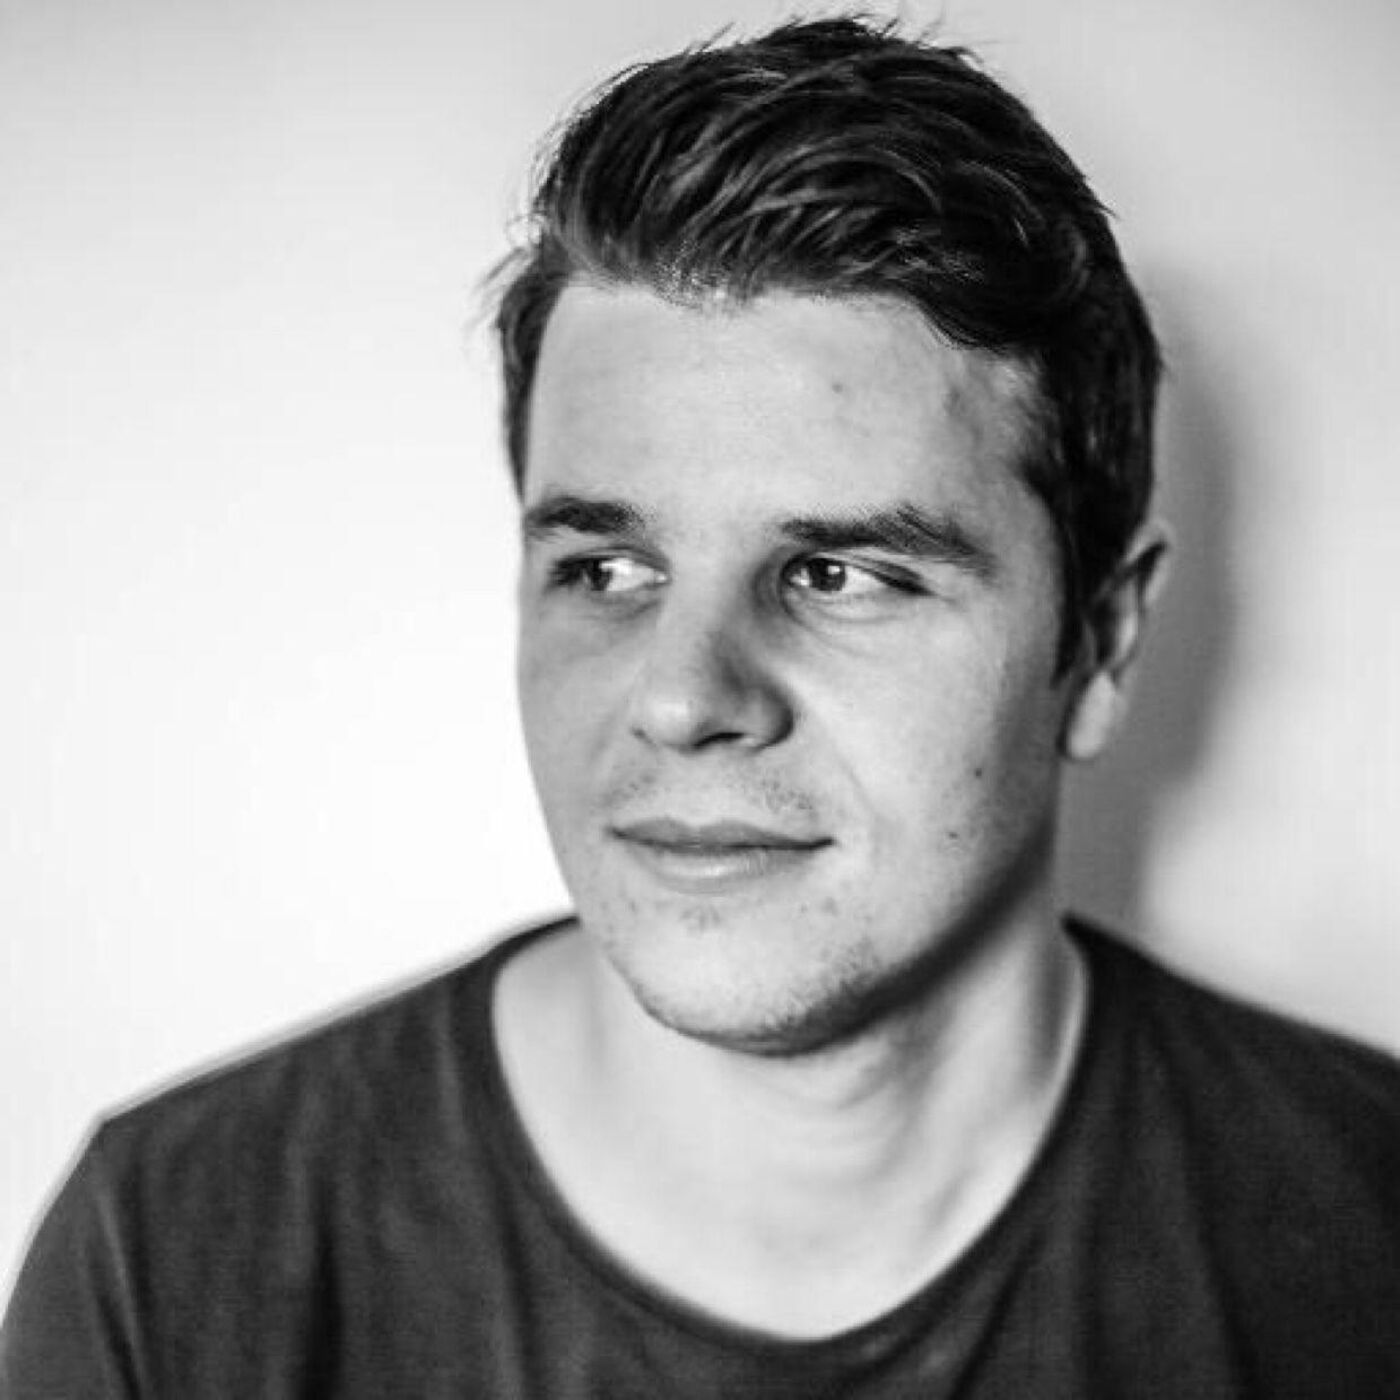 Cameron Rambert, Founder & CEO of Freelance Australia